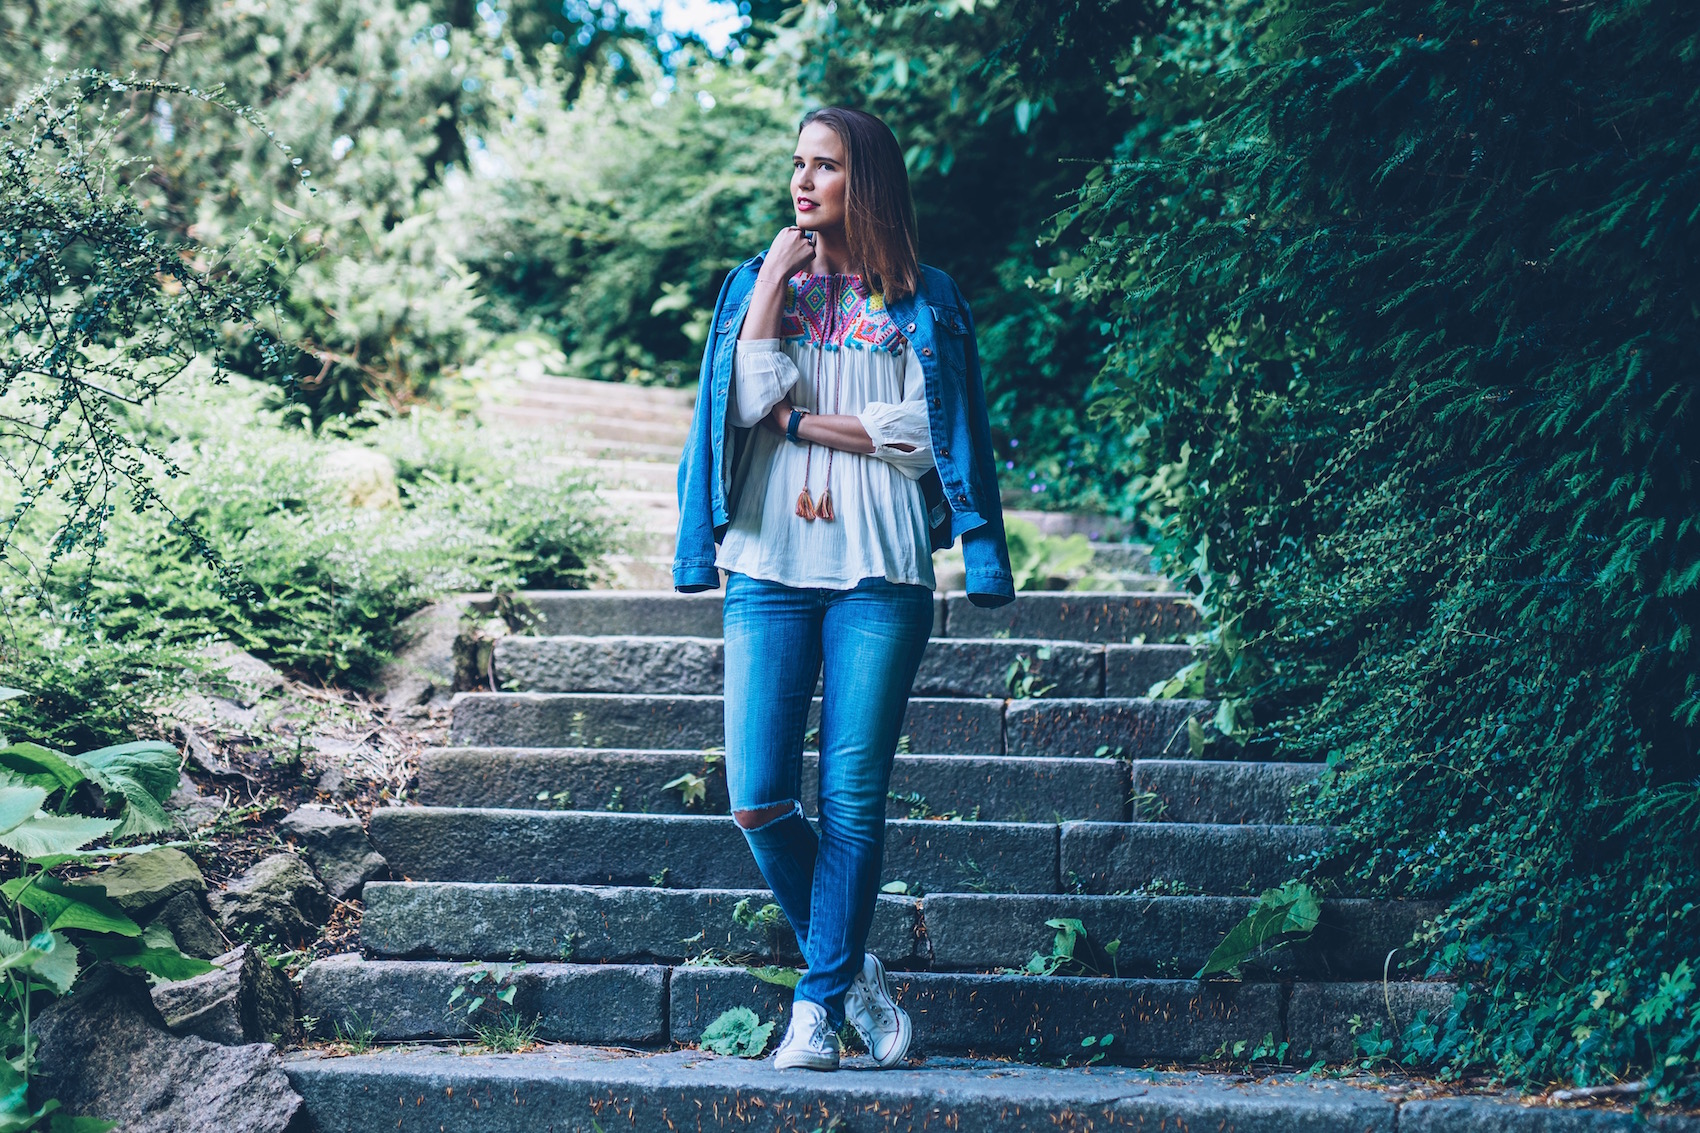 suelovesnyc_susan_fengler_blog_blogger_online_editor_dennis_kayser_jeansjacke_outfit_Hamburg_folklore_bluse_3